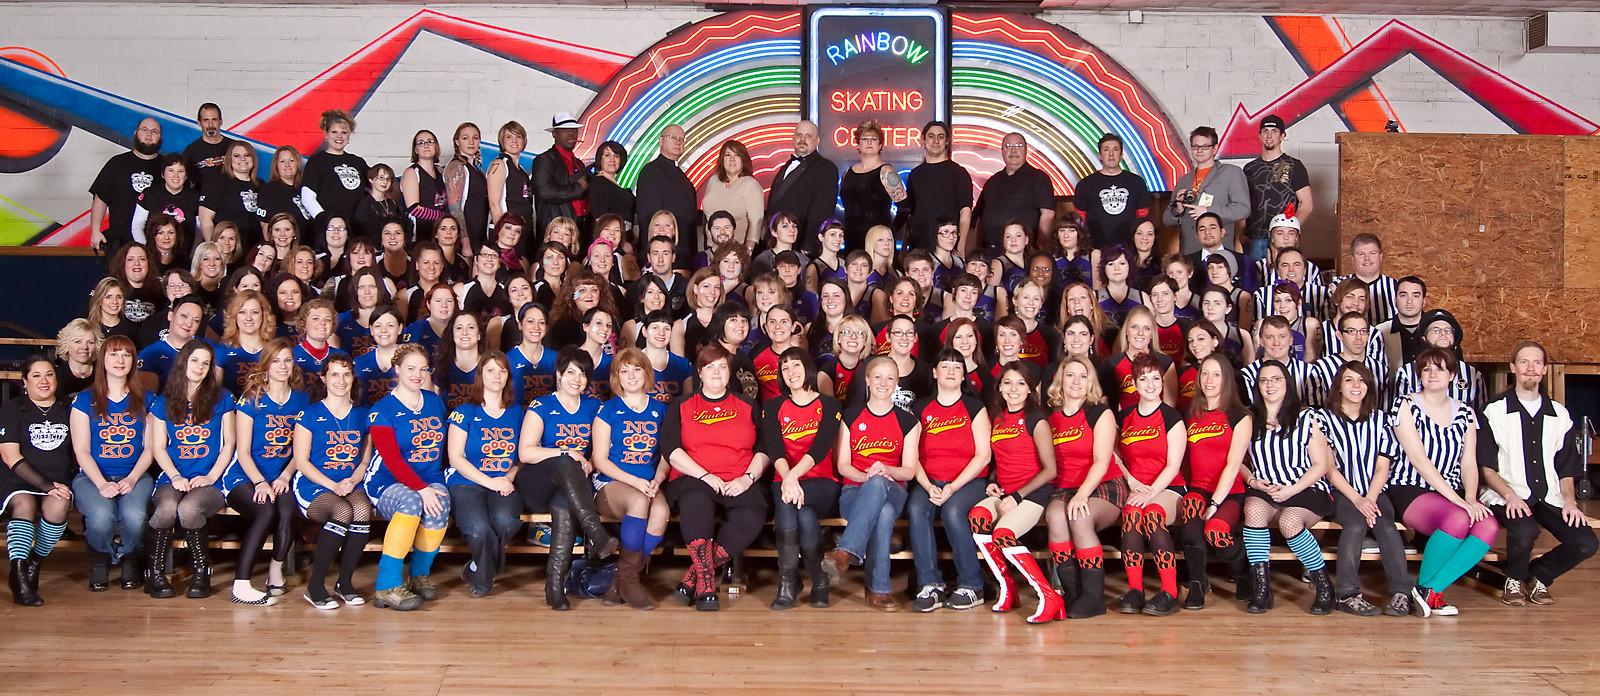 2010 Queen City Roller Girls | Photo by Fritzenfrat